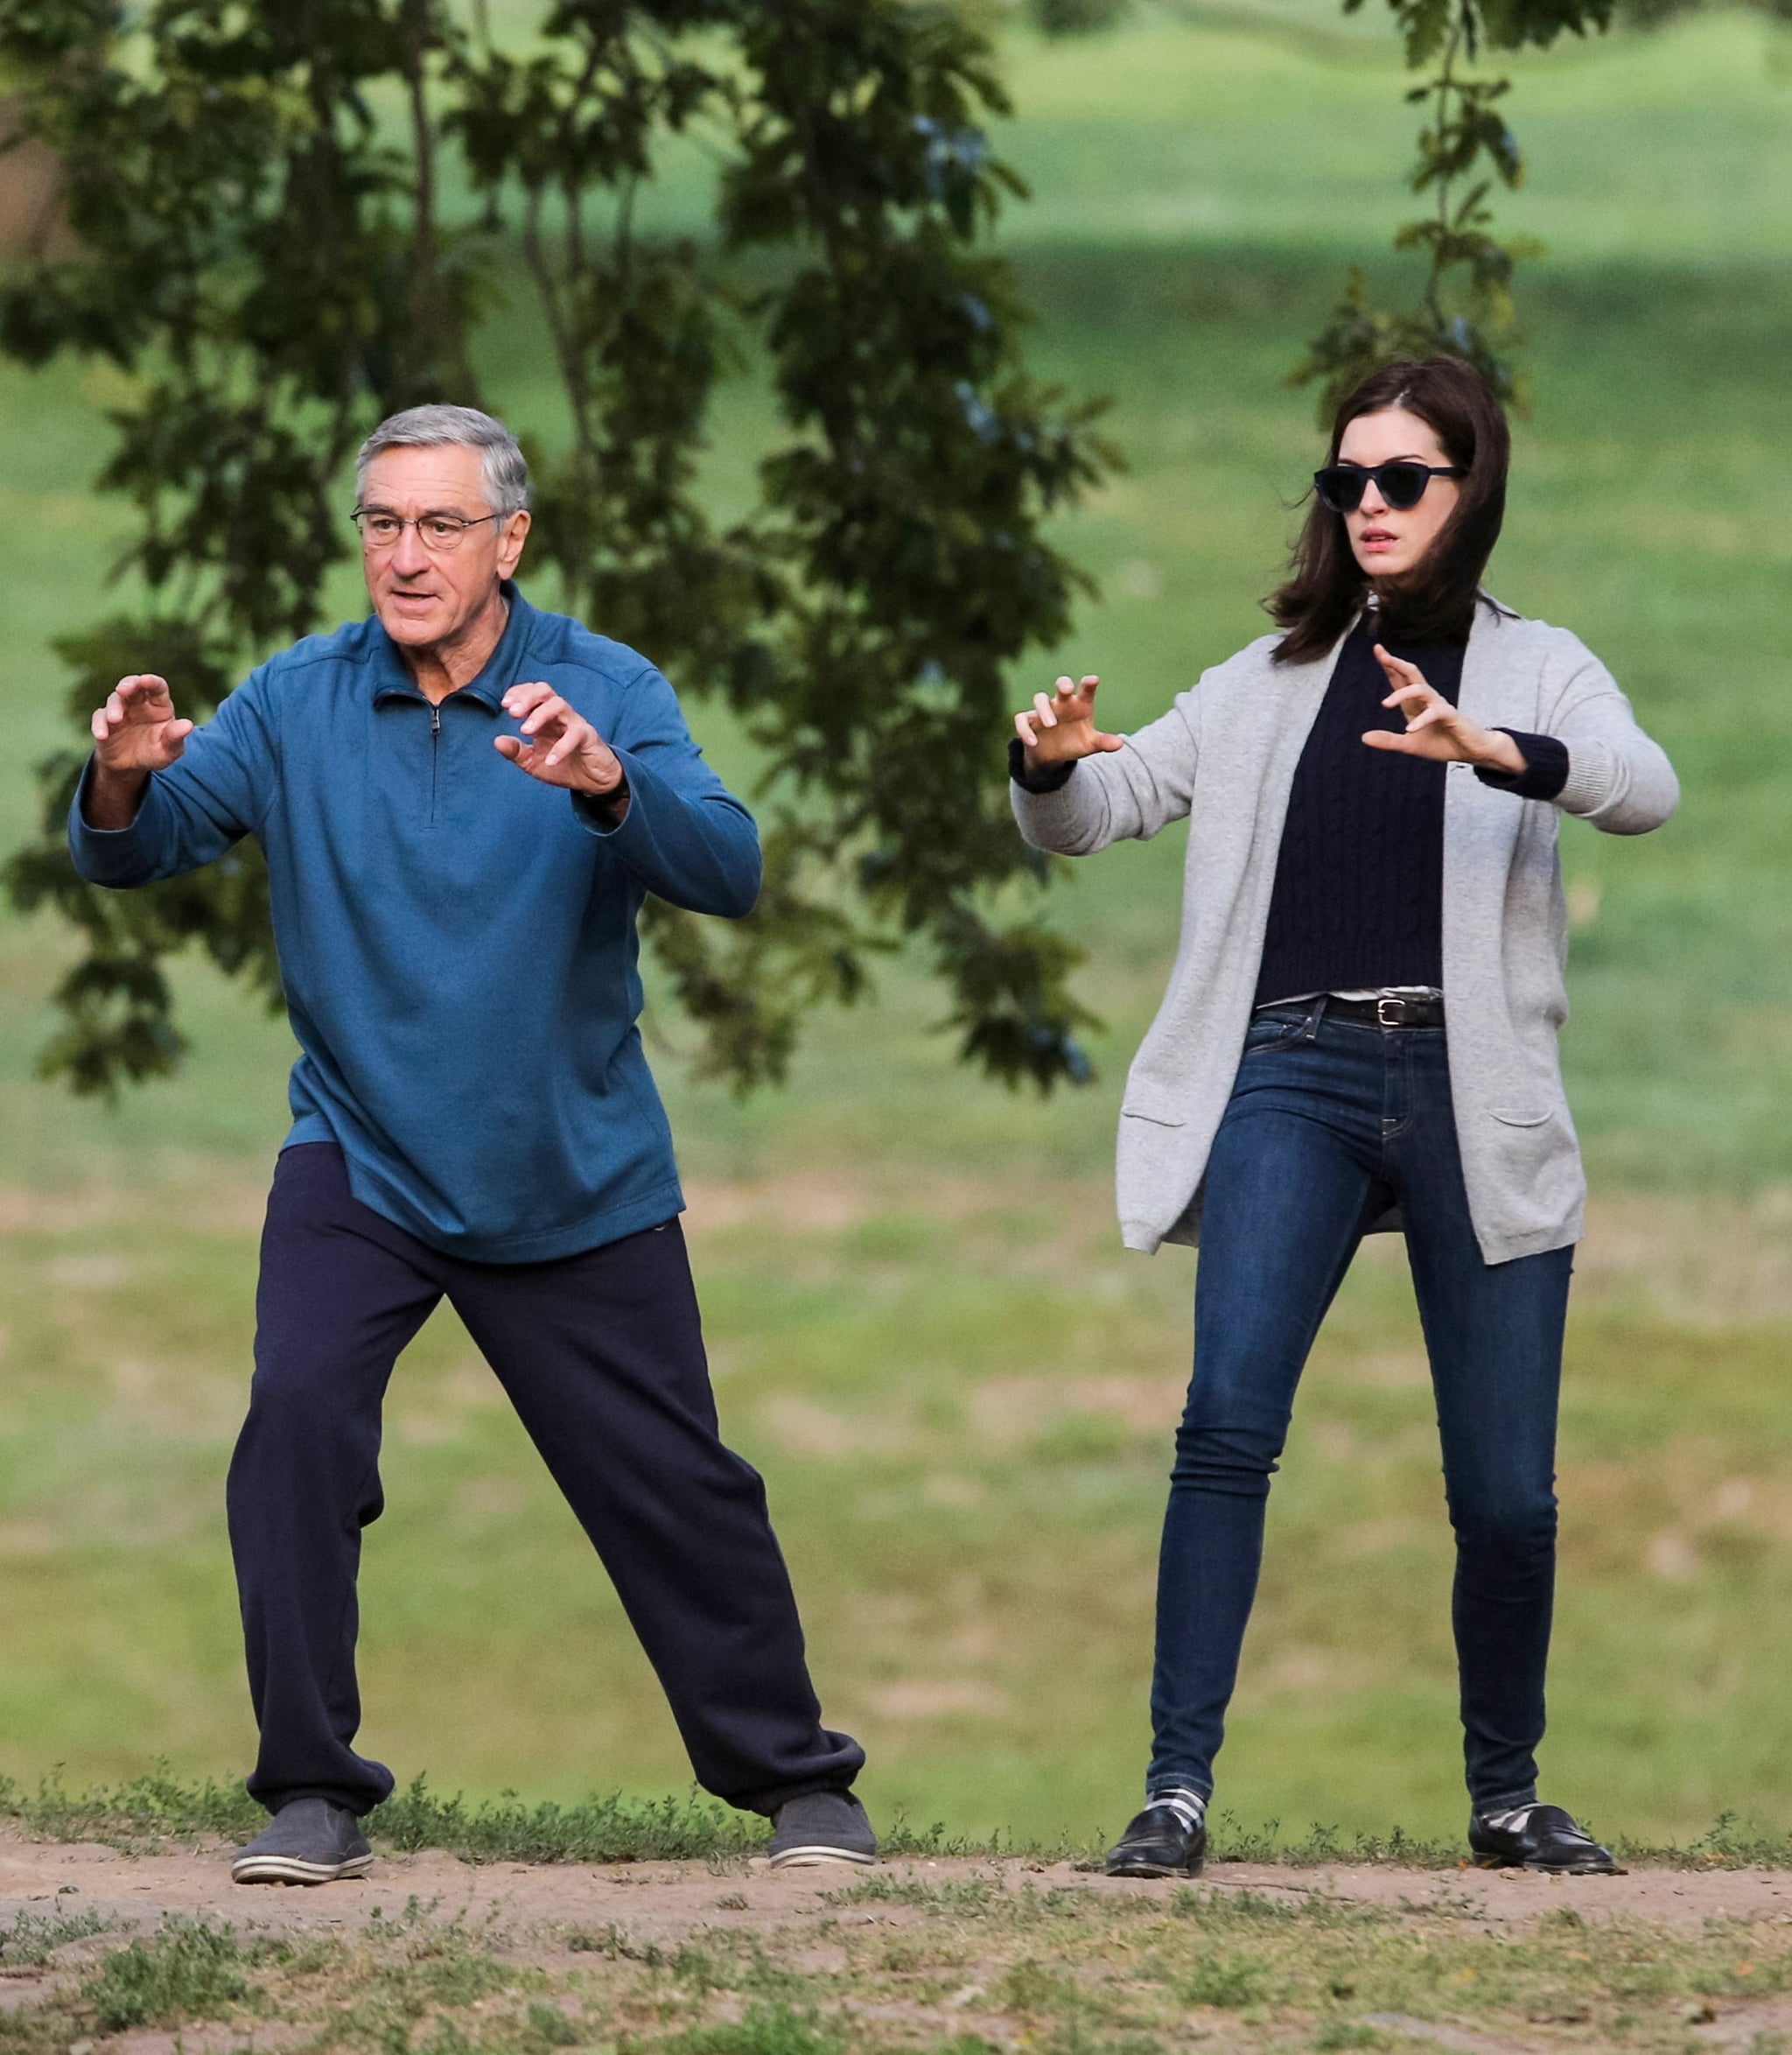 Anne Hathaway Robert De Niro Movie: Robert De Niro And Anne Hathaway Had Fun With Tai Chi